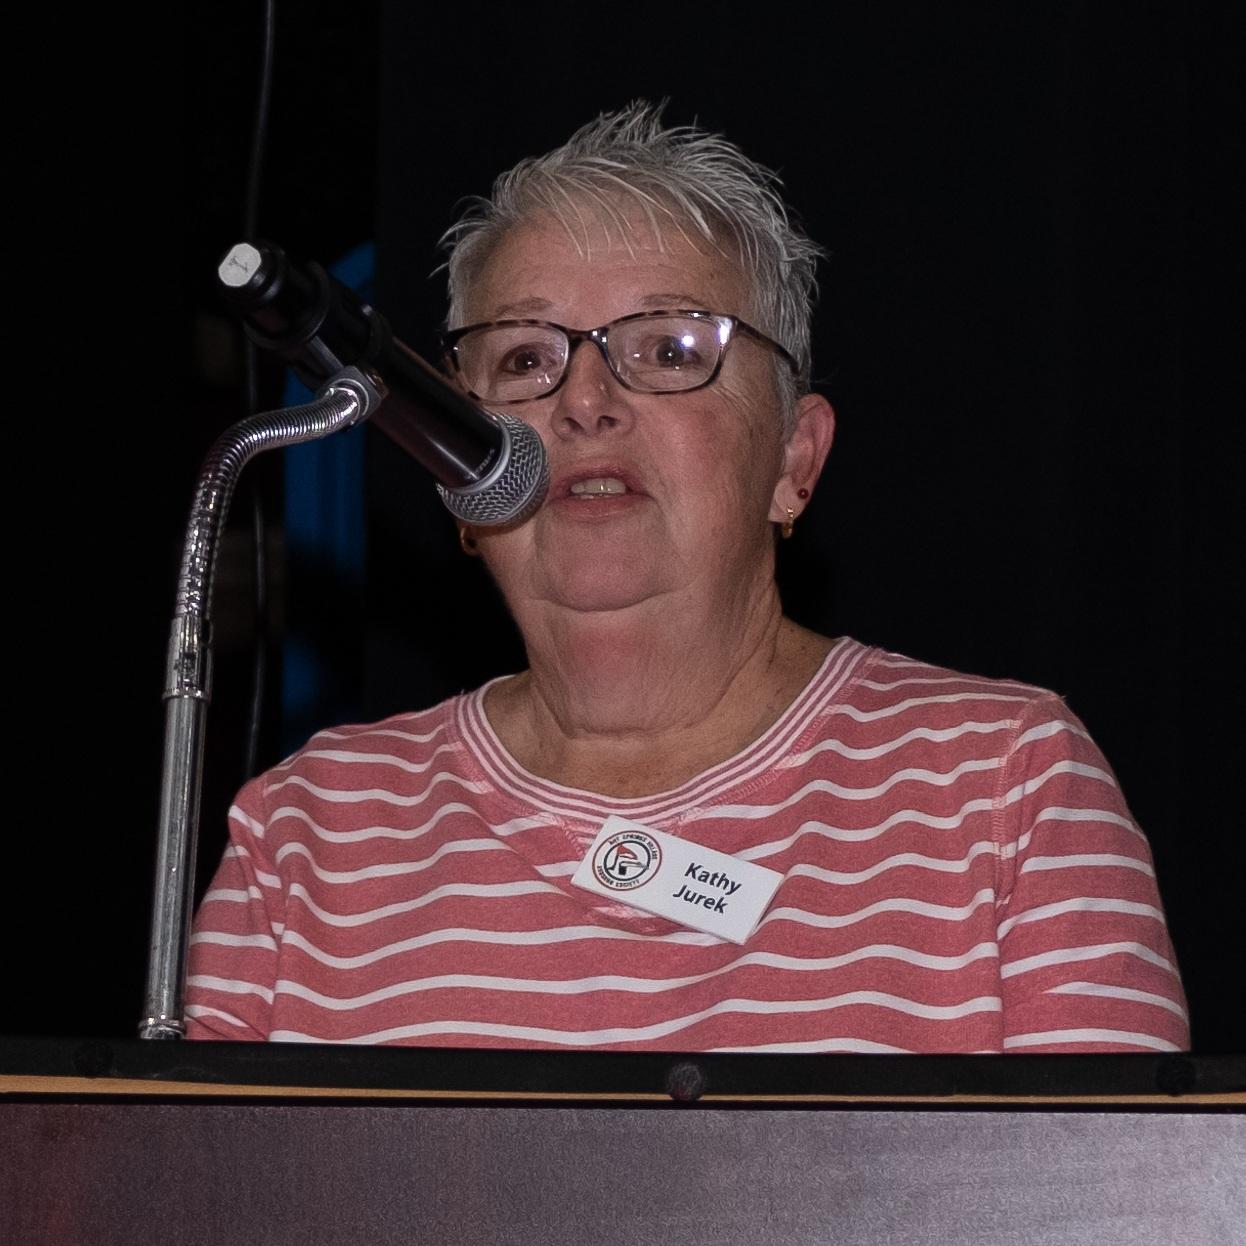 Kathy Jurek